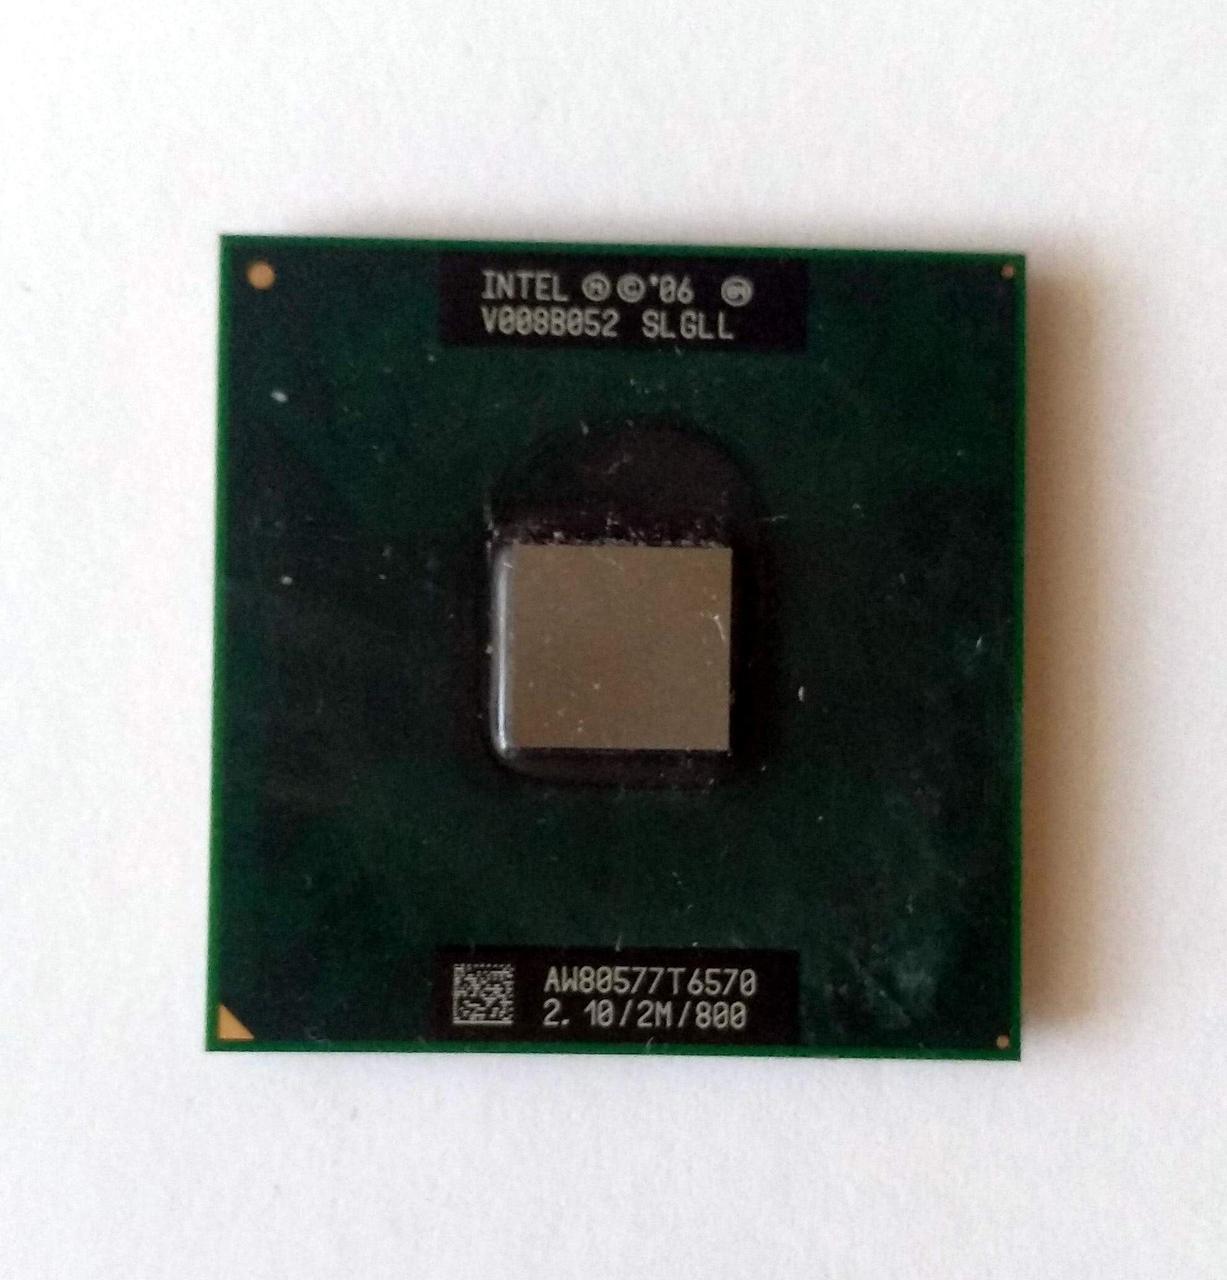 447 Intel Core 2 Duo Mobile T6570 2100 MHz SLGLL Socket P 2 ядра 64 бита процессор для ноутбуков